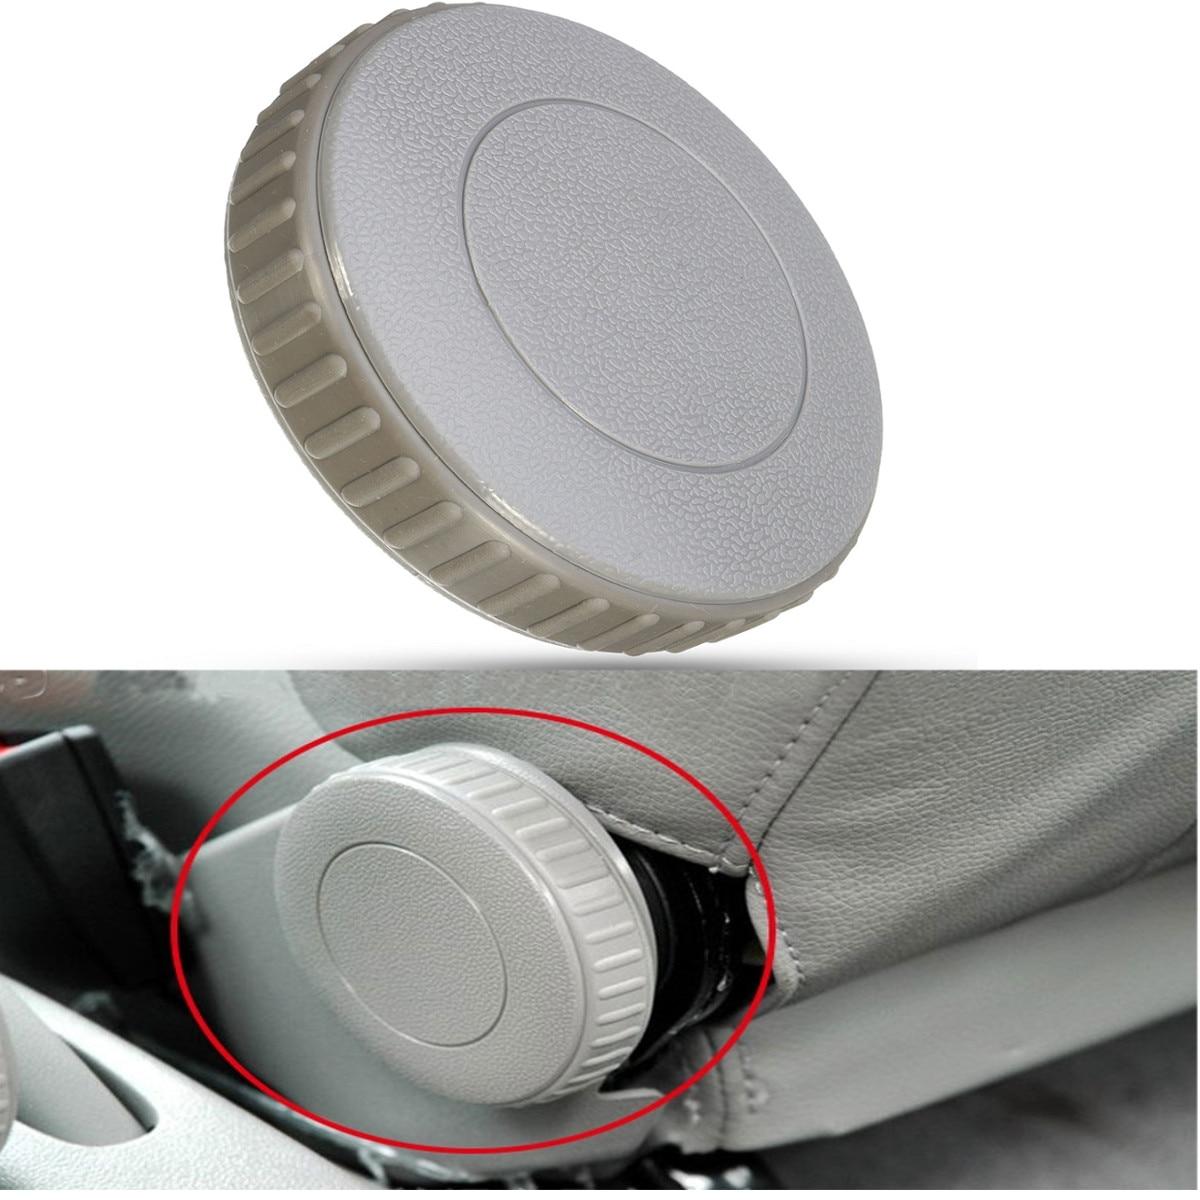 Car Front Seat Recline Knob Adjust Handle 1J0 881 671 H For VW Rabbit Jetta MK5 Golf MK6 Rabbit